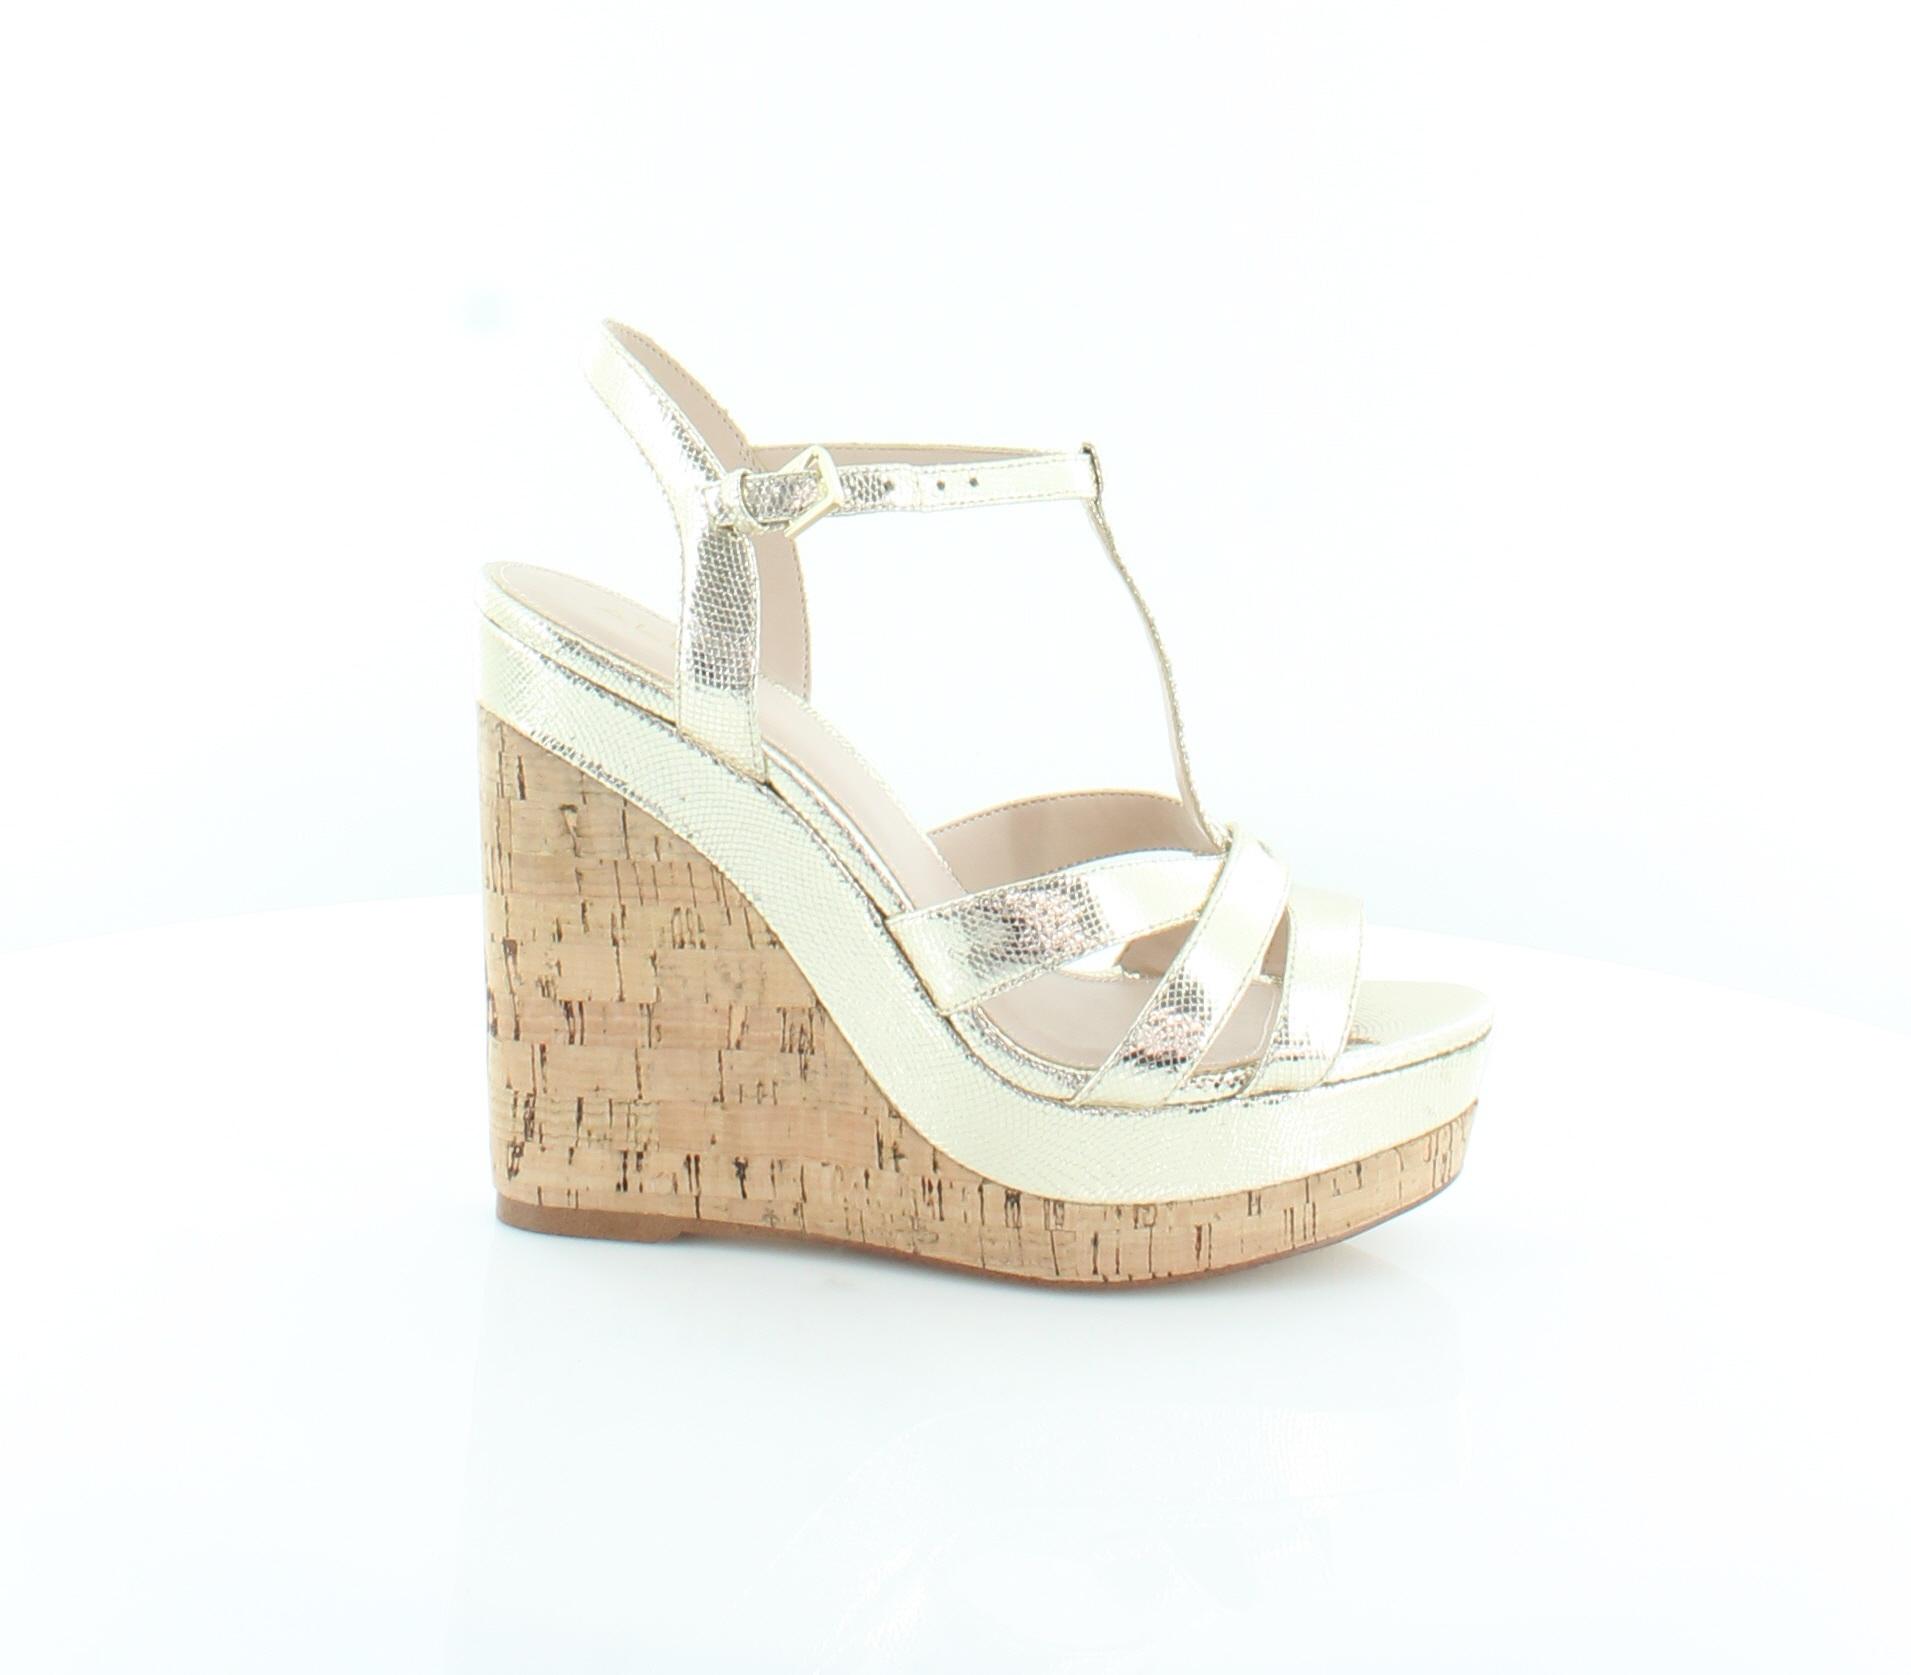 ALDO Gold Metallic Stiletto Heels Pumps Size US 8 Regular (M, B)